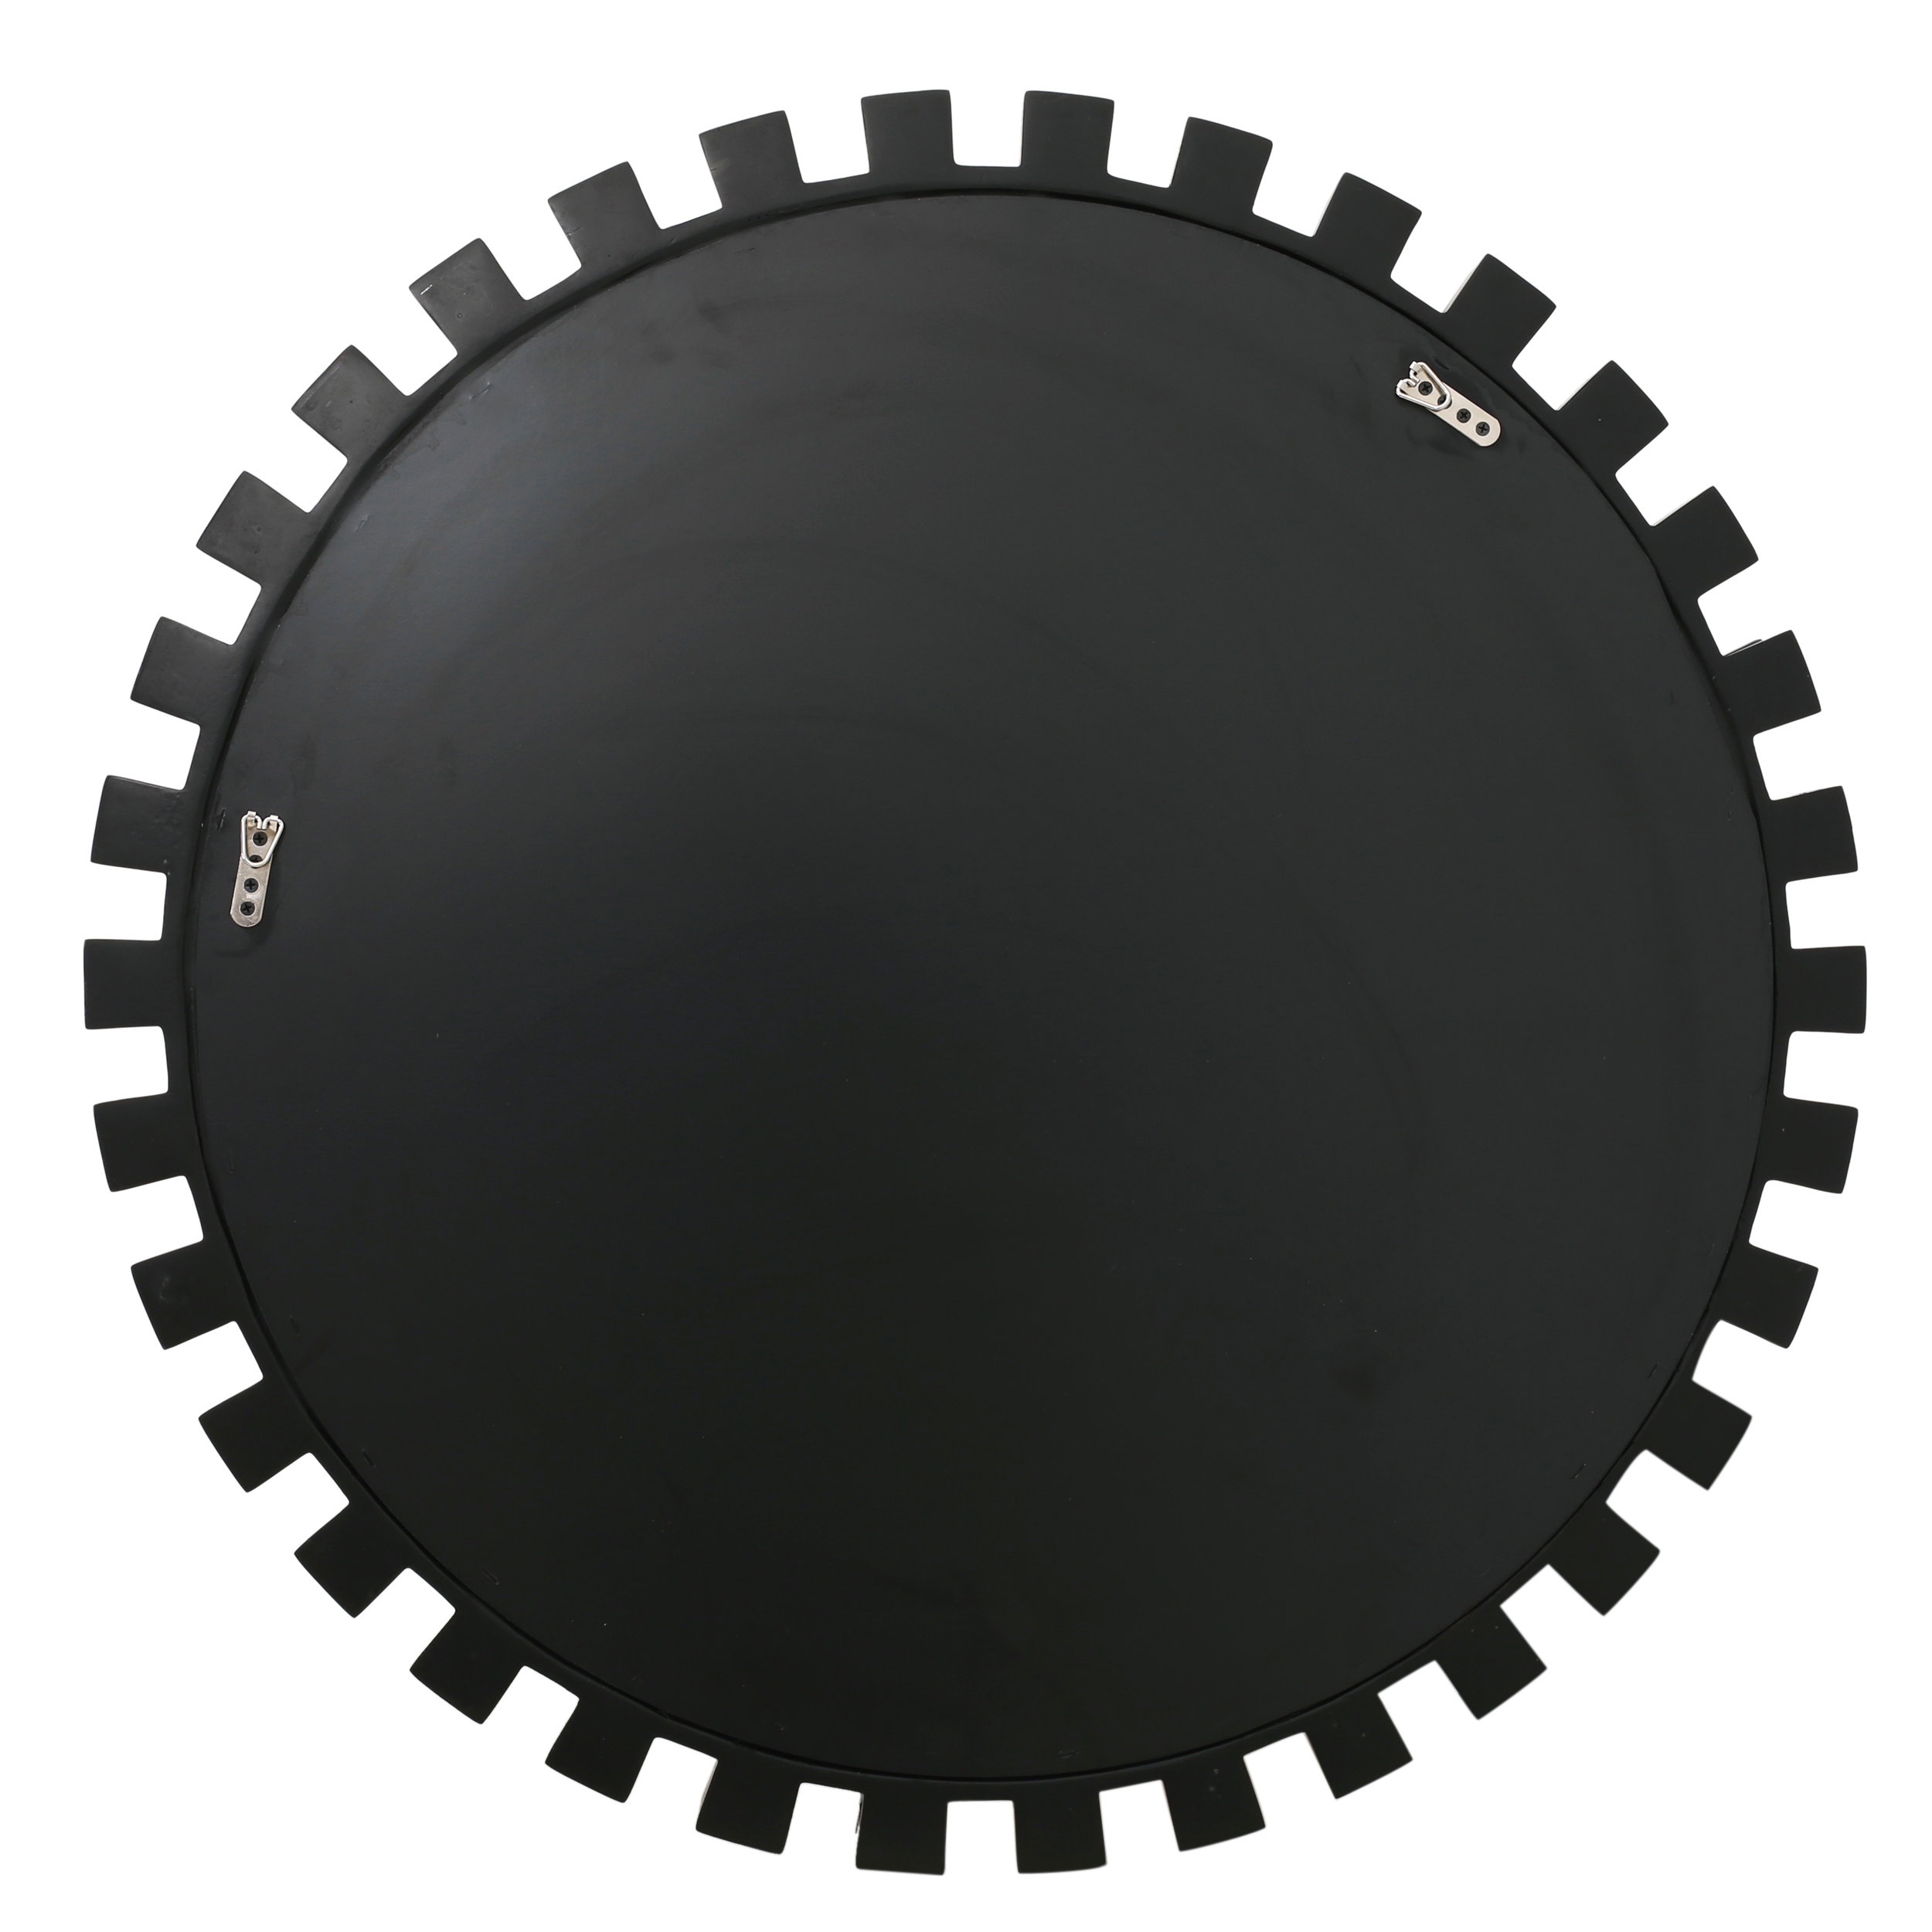 Willa Arlo Interiors Deniece Sunburst Round Wall Mirror Within Deniece Sunburst Round Wall Mirrors (Image 20 of 20)